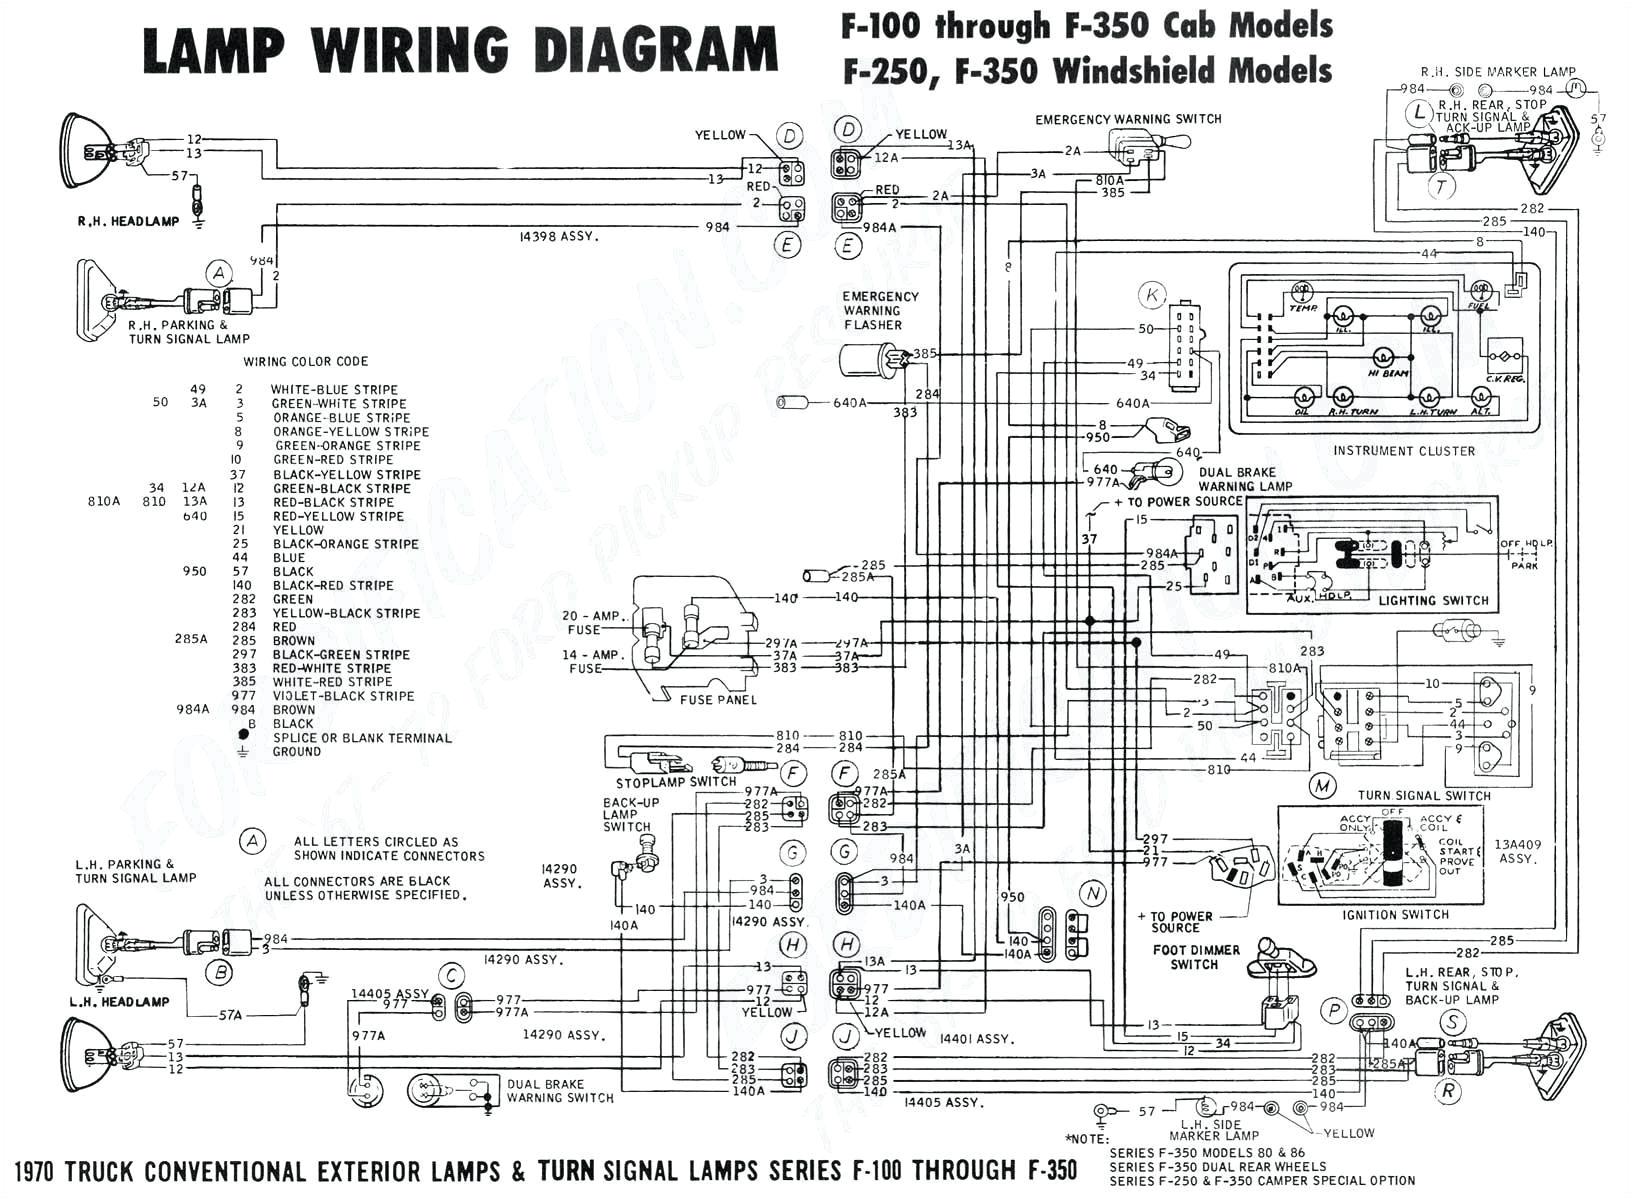 2002 jeep liberty cooling fan wiring diagram hecho wiring diagram jeep grand cherokee cooling system diagram 1990 jaguar fuse diagrams